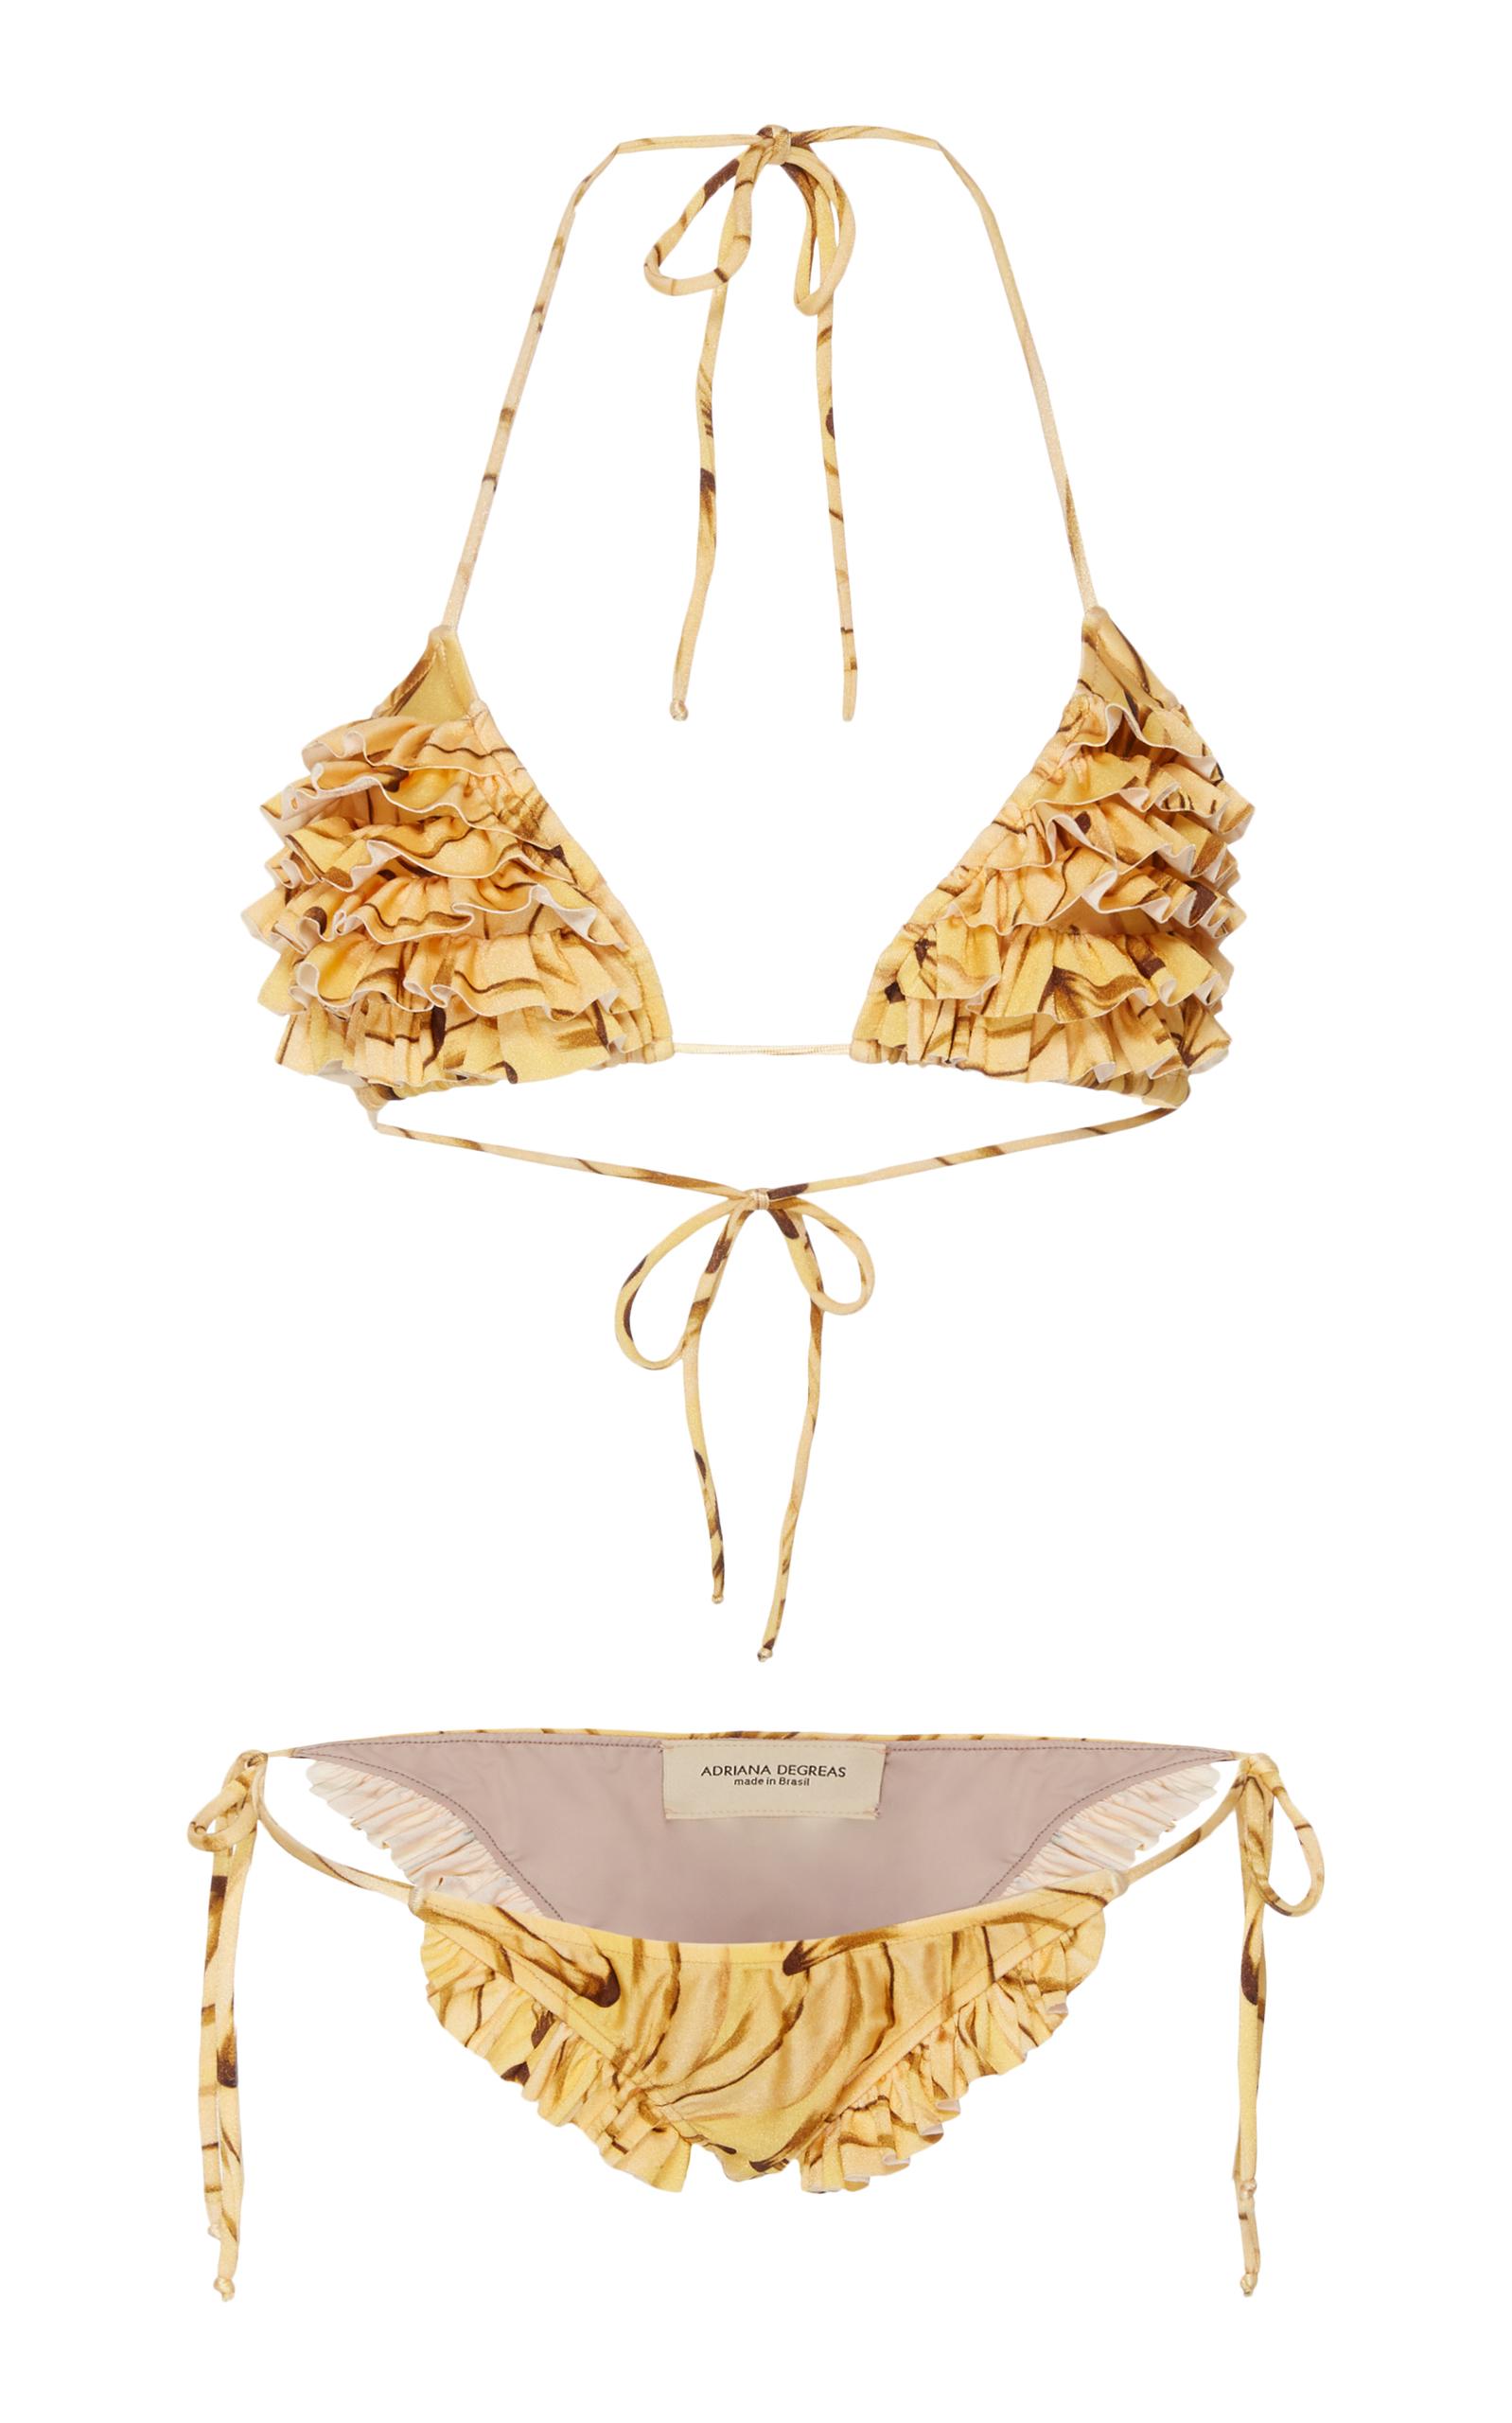 5c5047761afbb Adriana Degreas Muse Print Triangle Bikini With Ties And Ruffles In Yellow